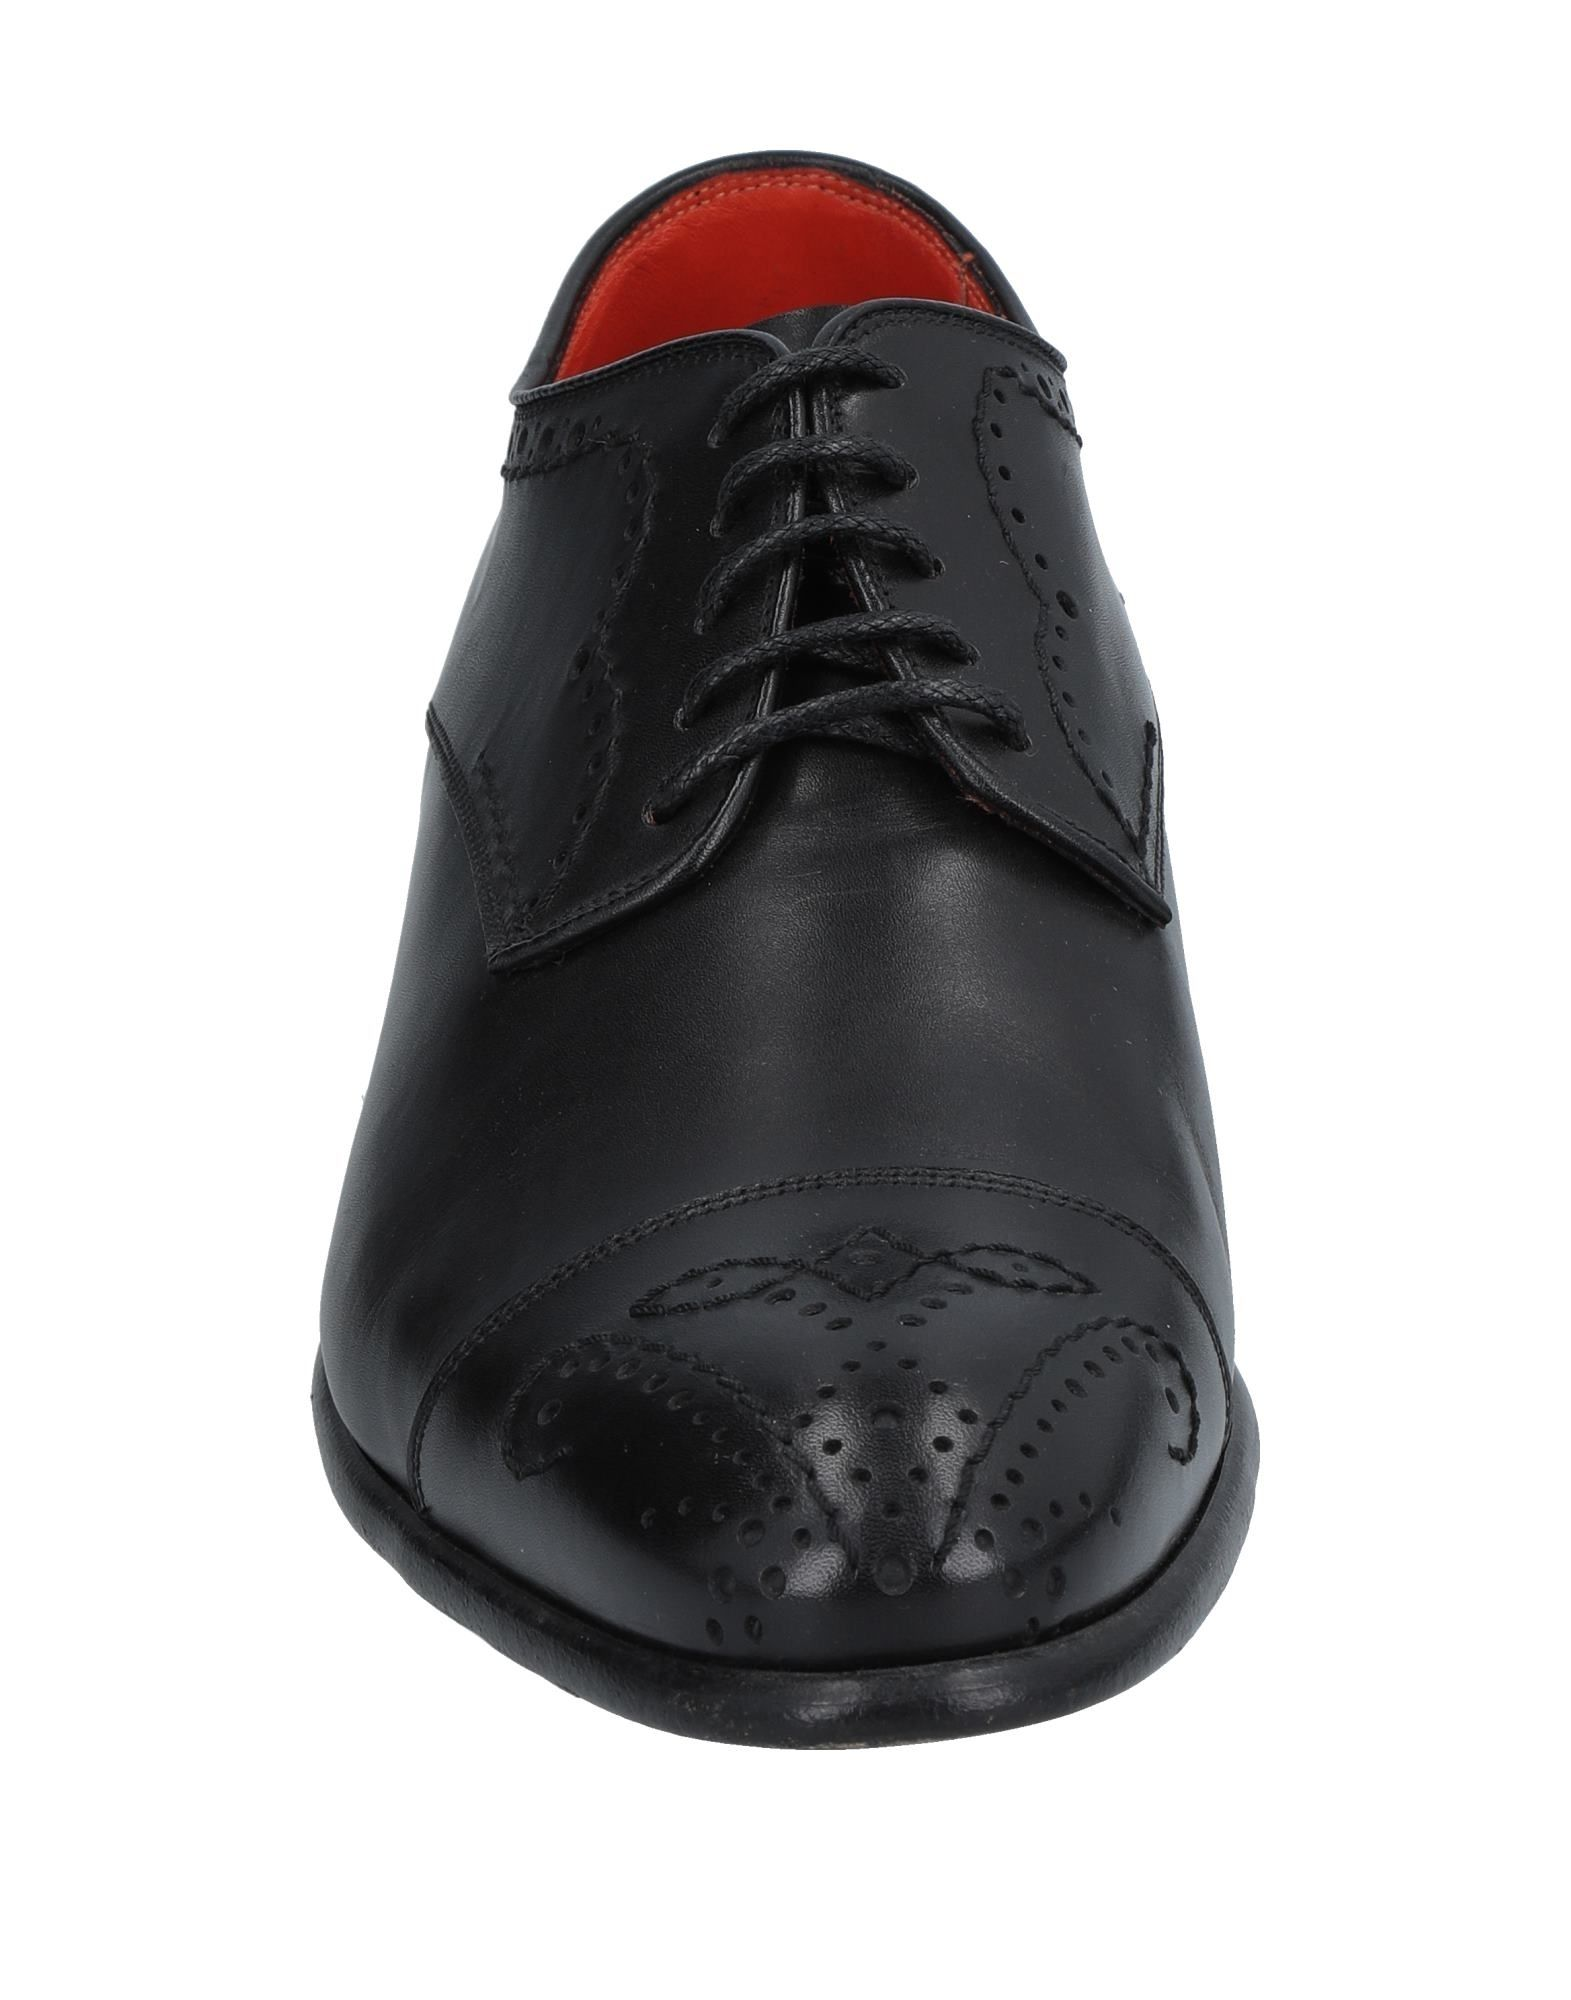 Botti Schnürschuhe Schnürschuhe Botti Herren  11537158AD Heiße Schuhe 71e957